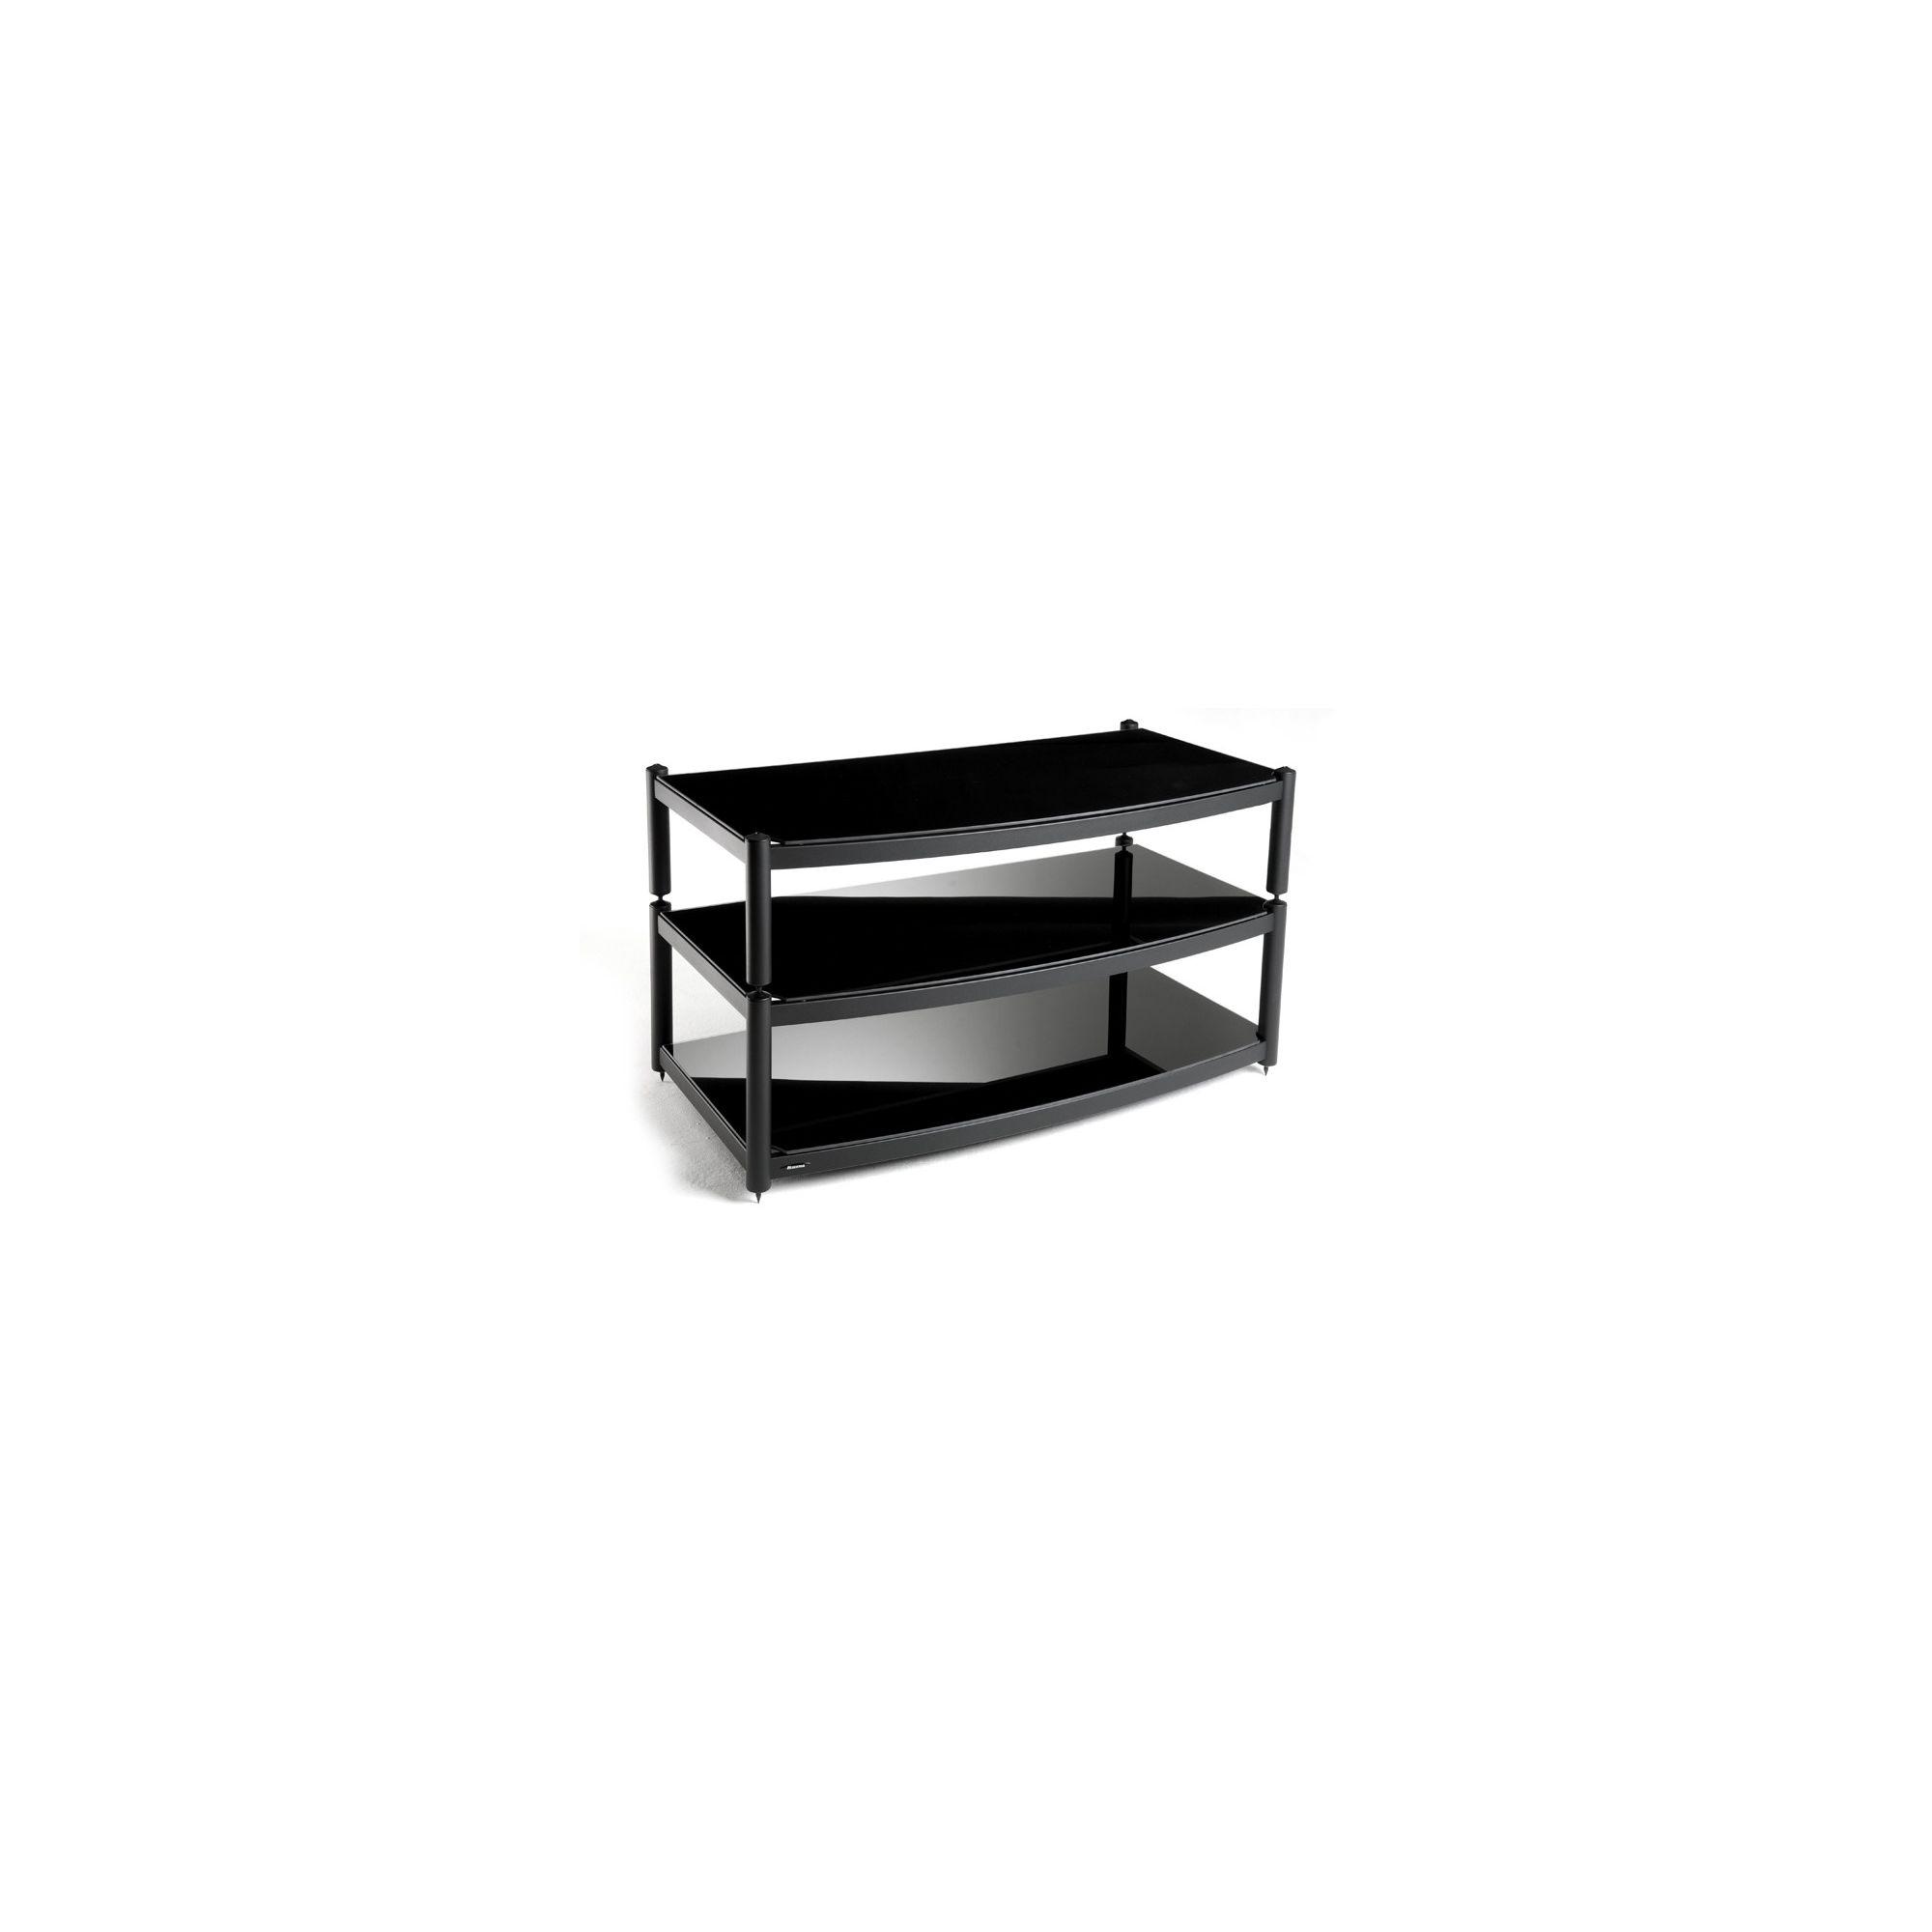 Atacama Audio Equinox Glass TV Stand for LCD / Plasmas - Black/ Piano Black at Tesco Direct